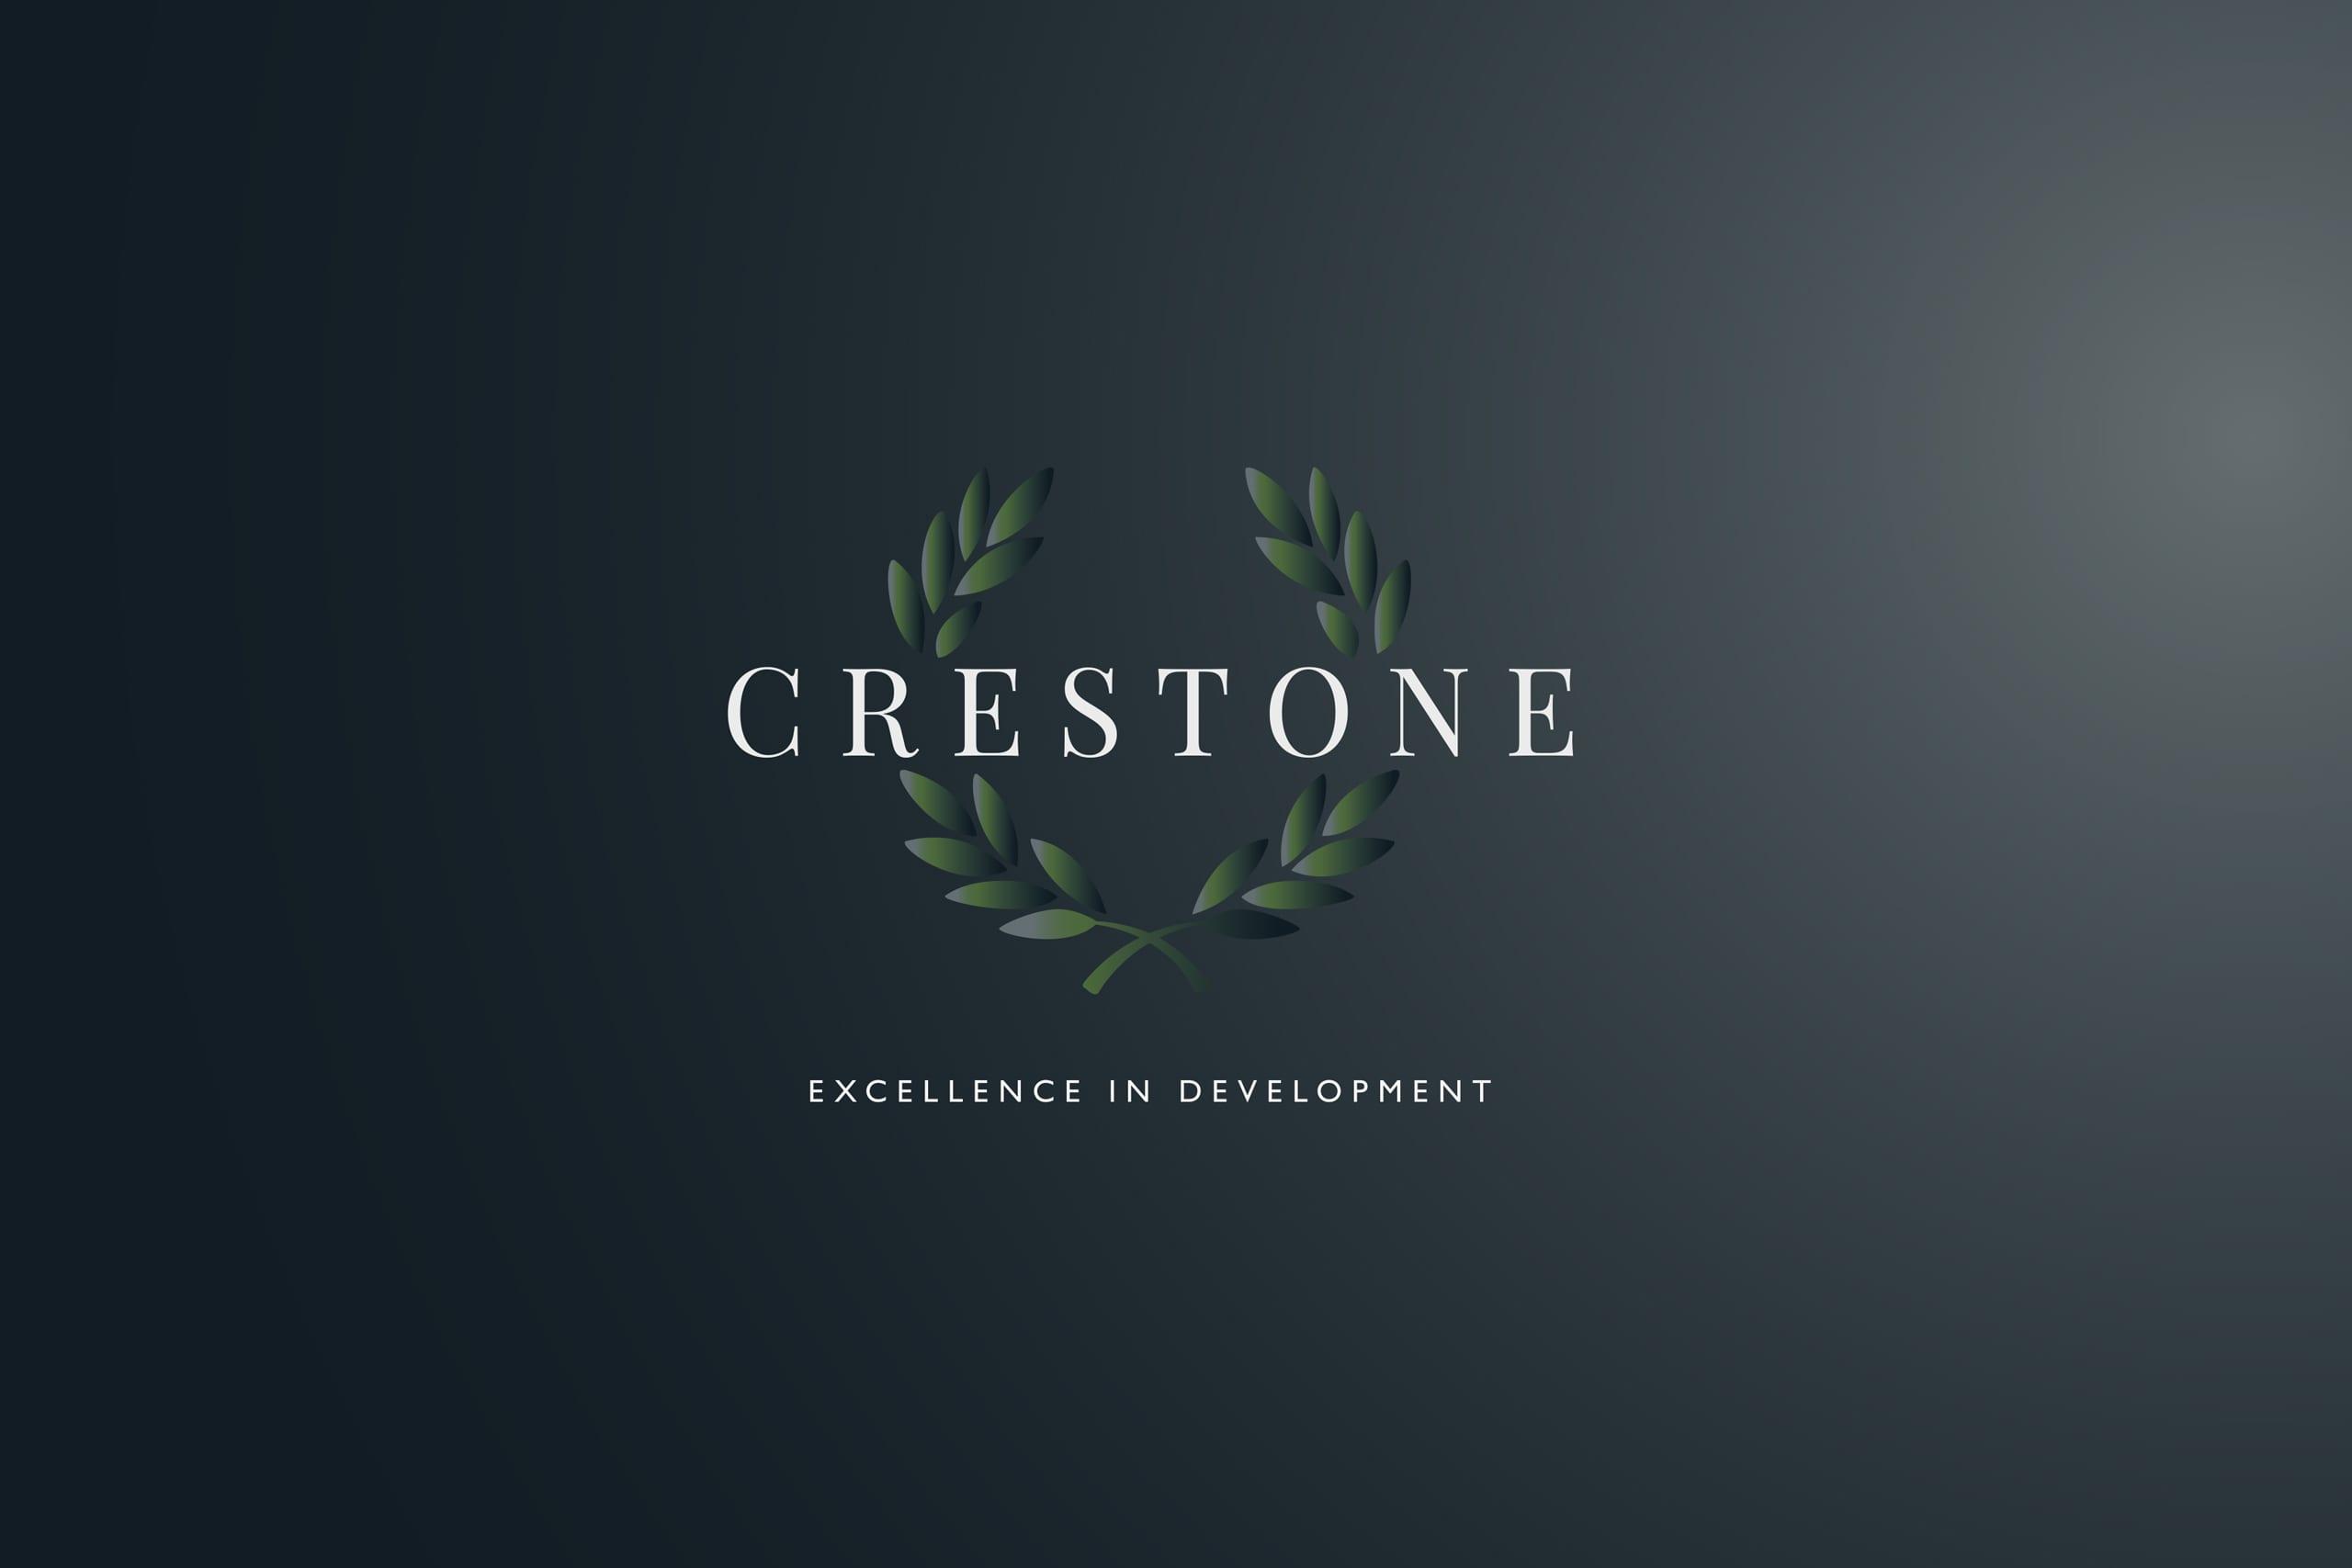 Crestone identity